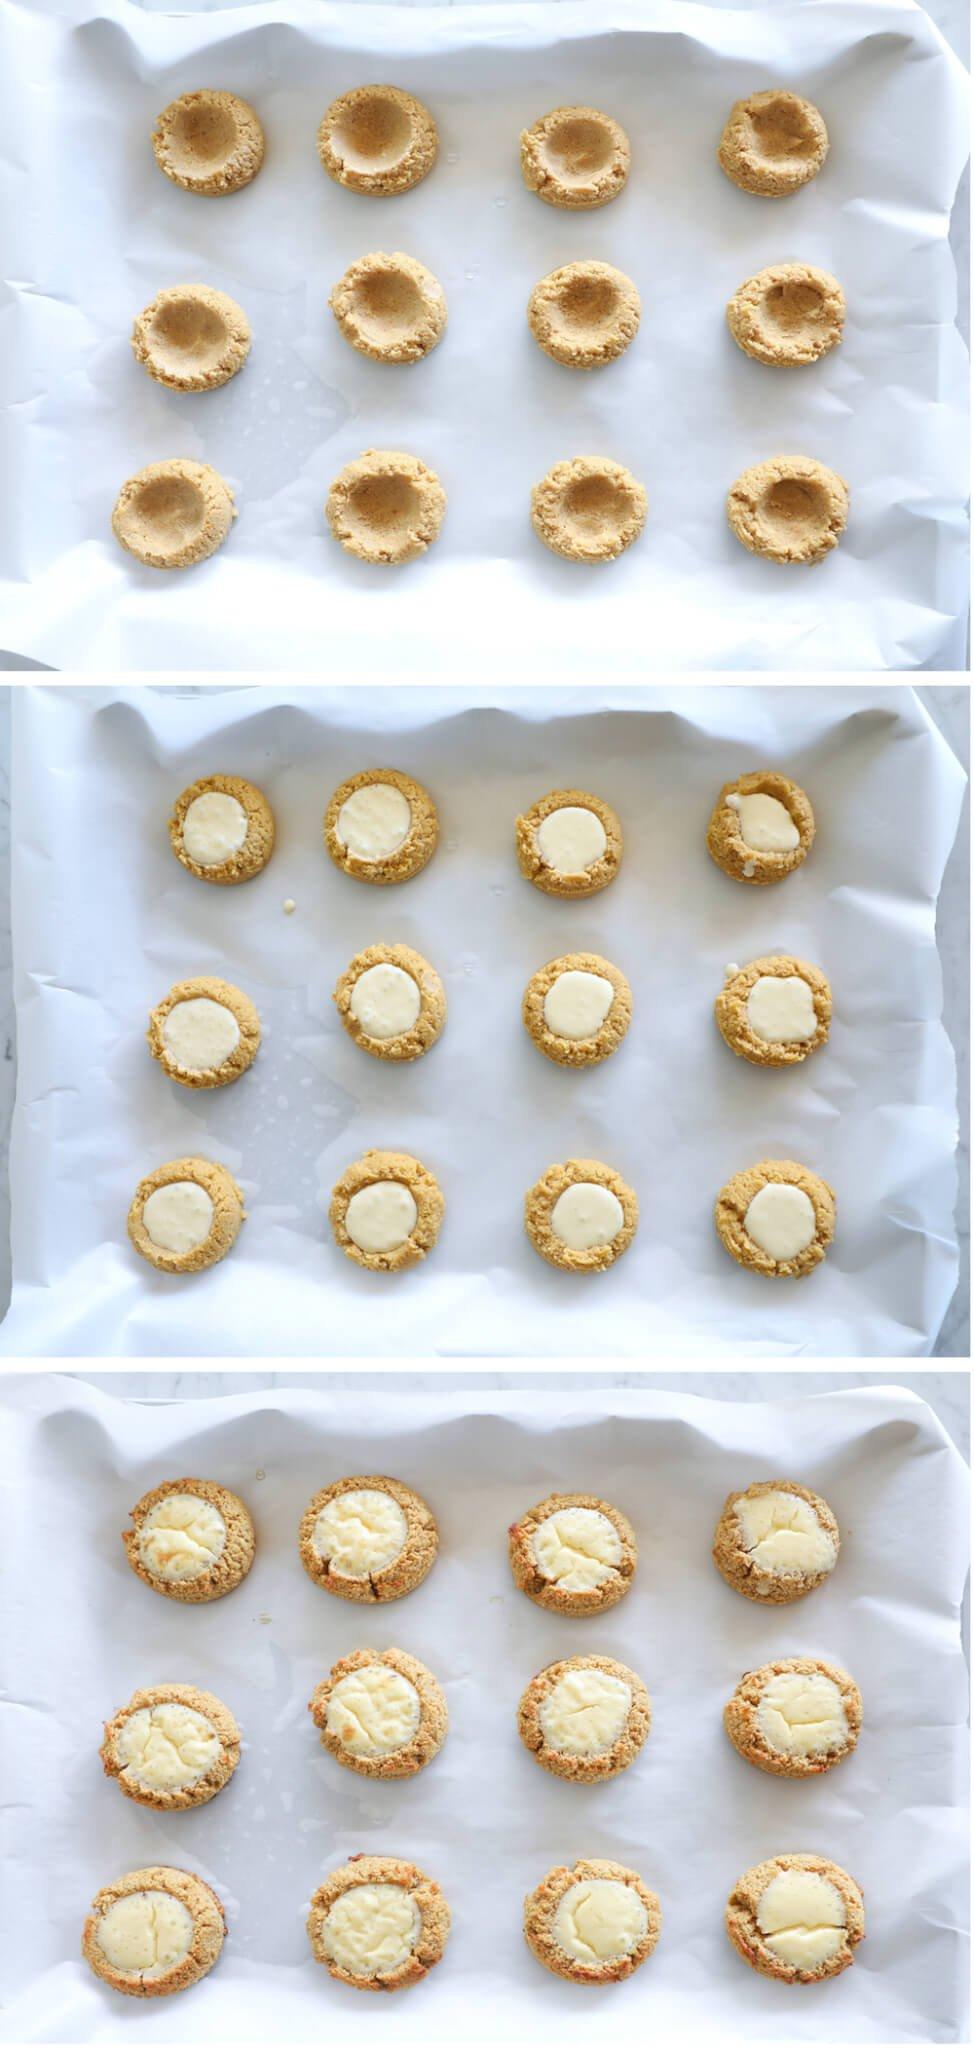 Keto Pumpkin Cookies tutorial photo